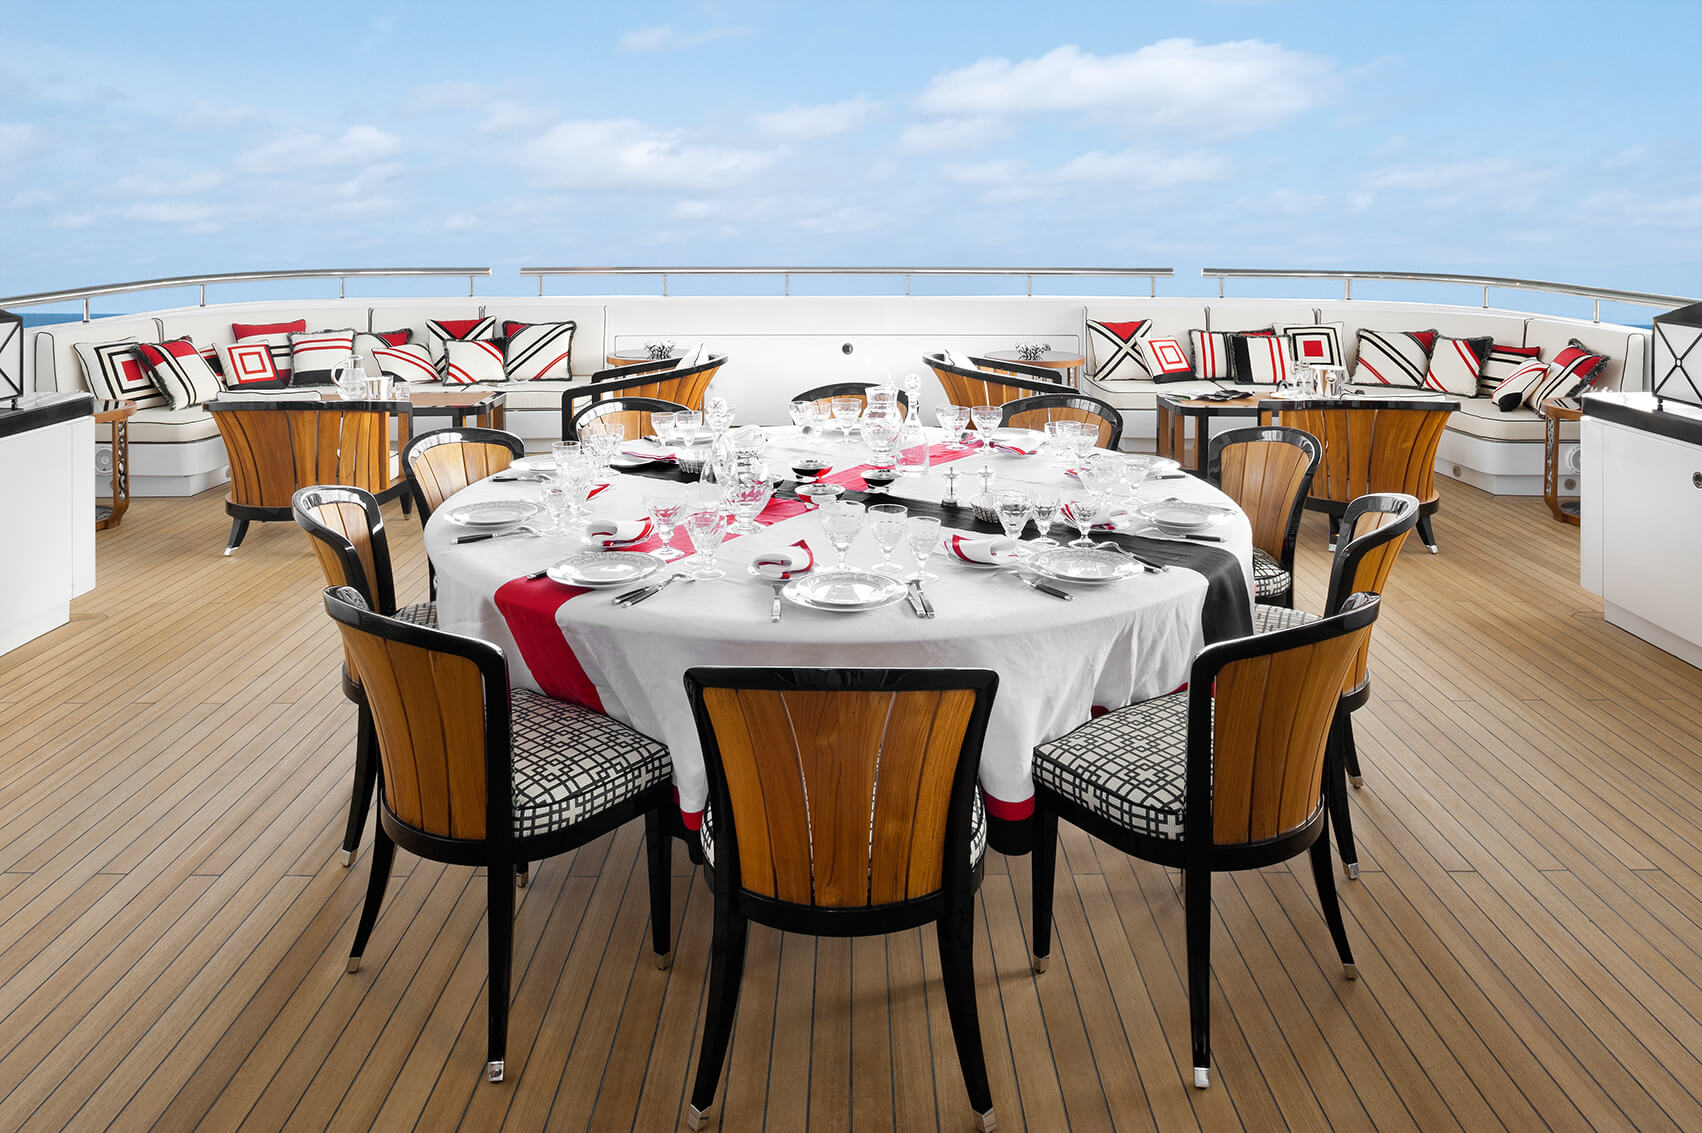 Bridge Deck Al Fresco Dining Area And Seating